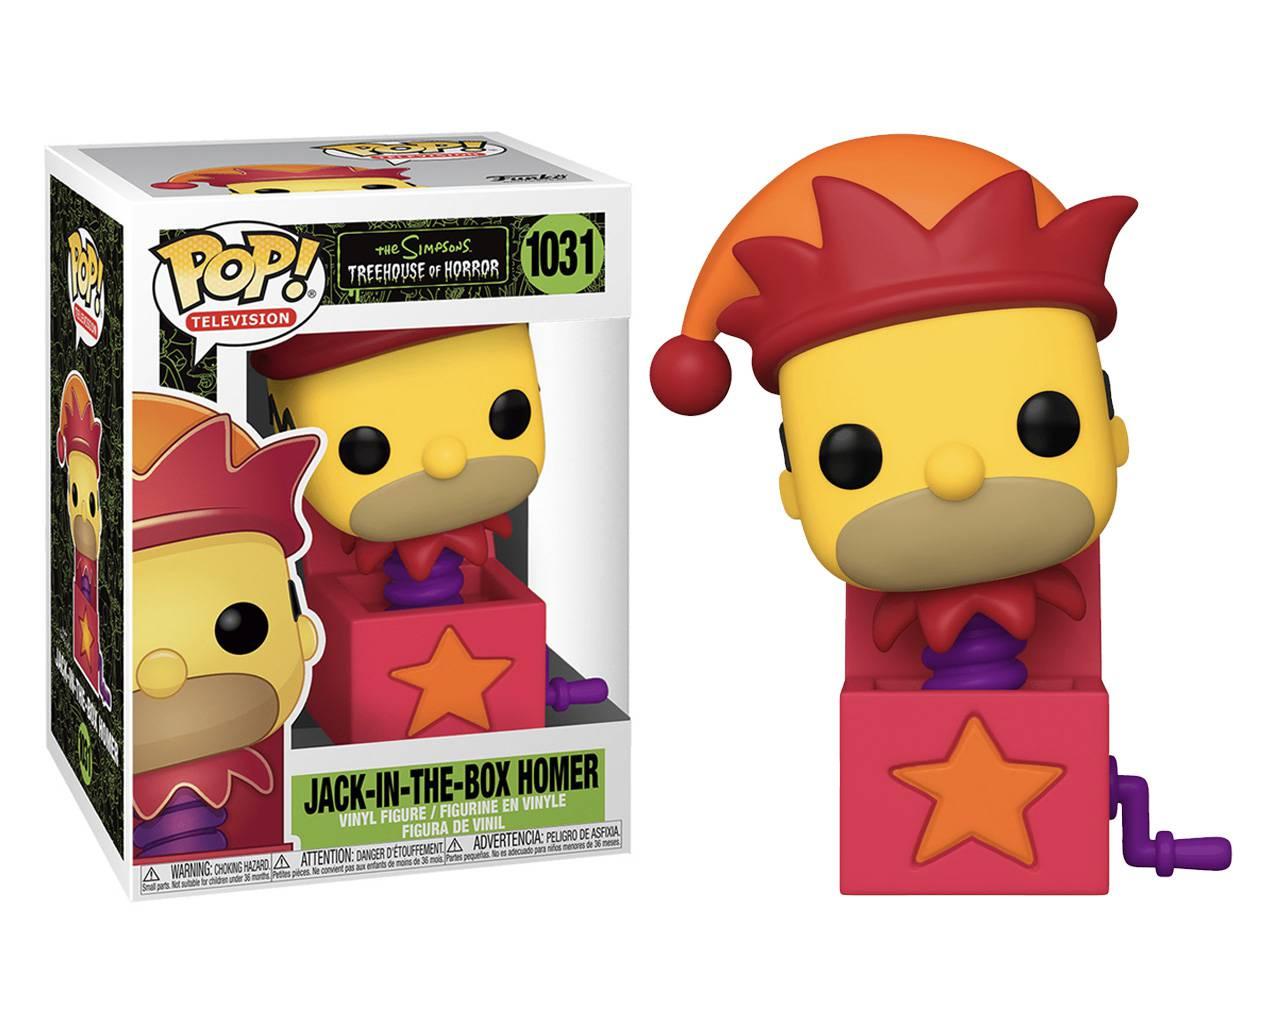 Jack in the box Homer Pop! Vinyl